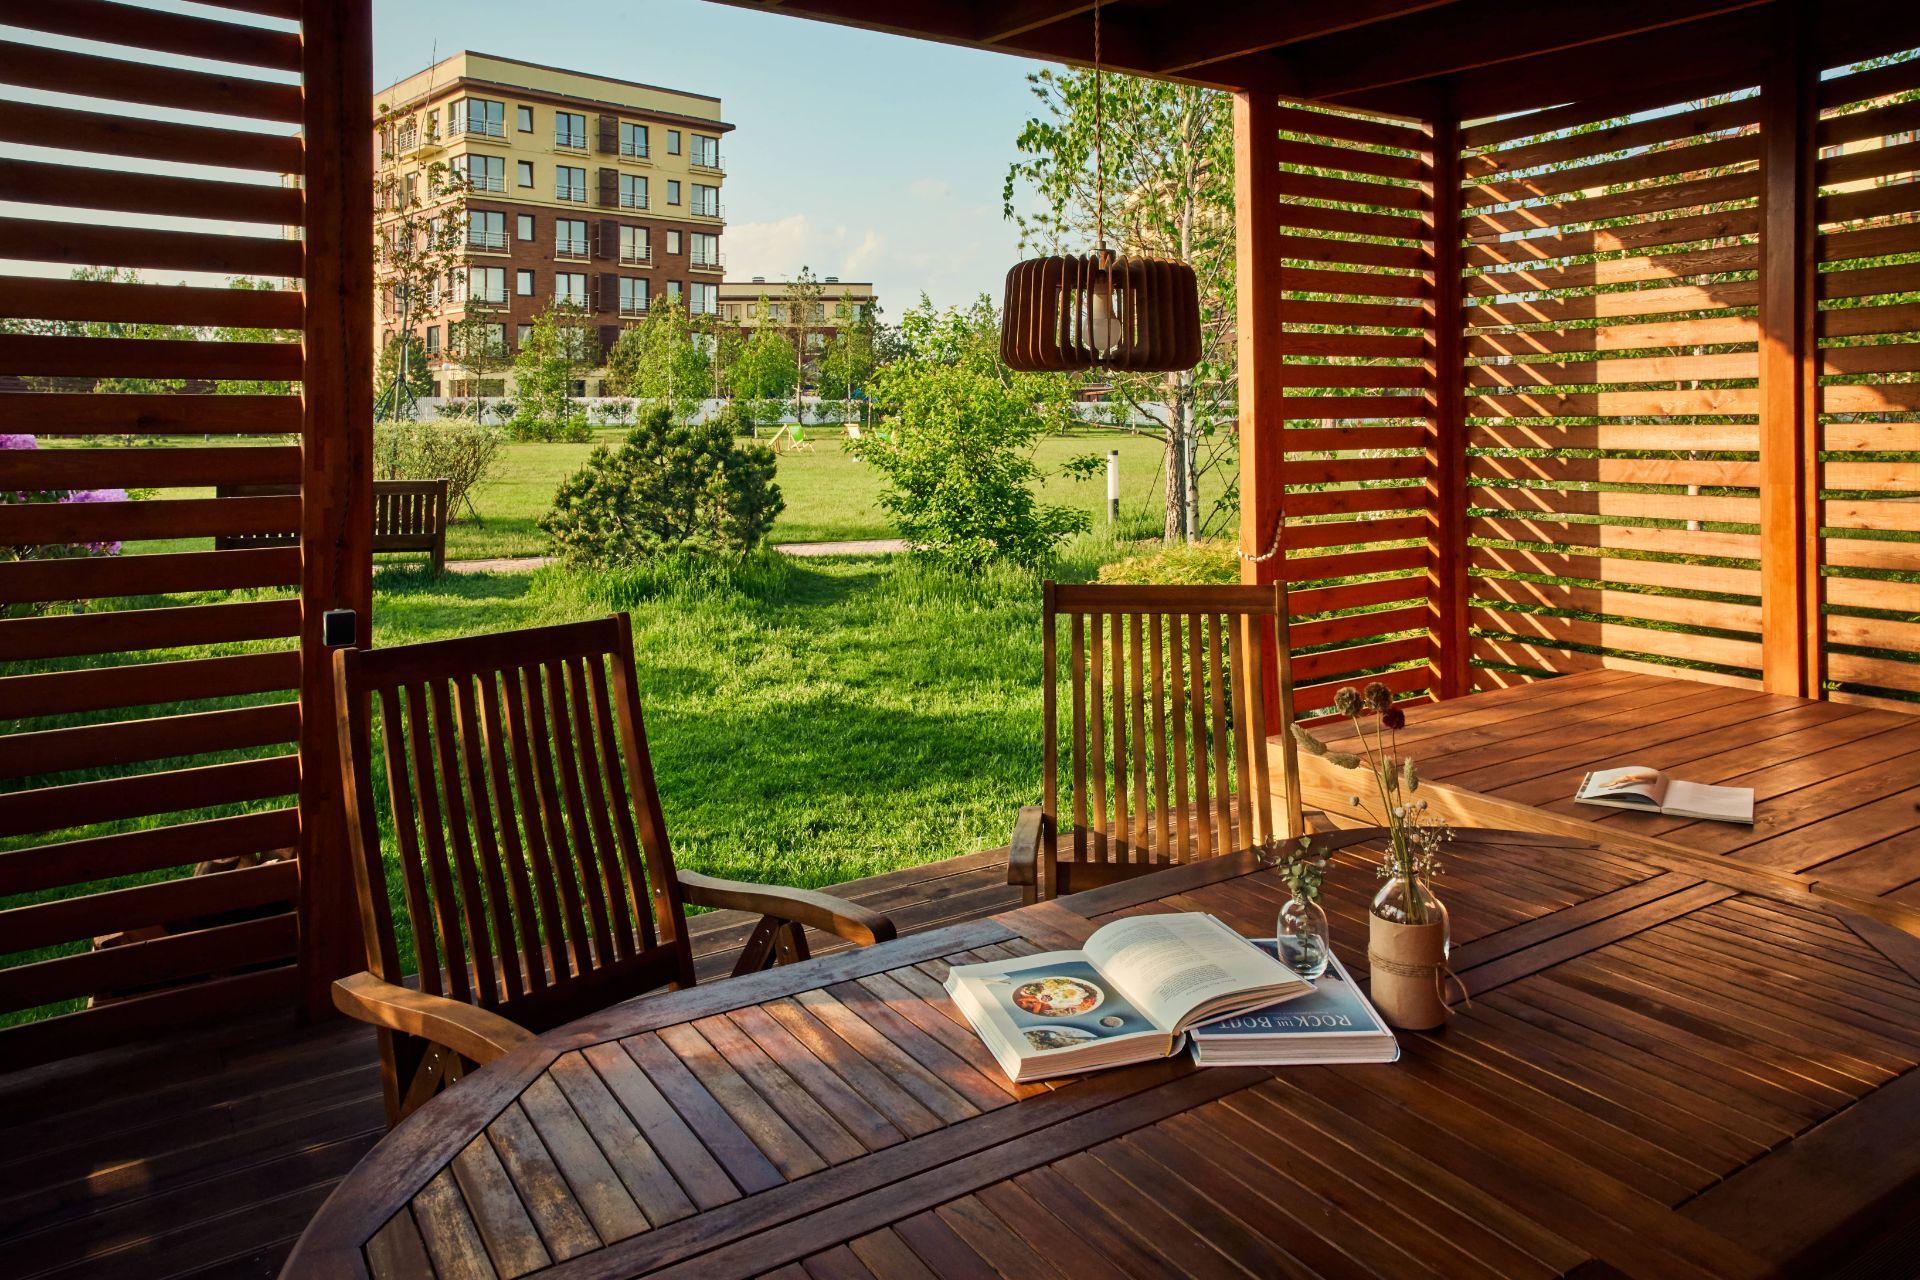 фото ЖК Vnukovo Country Club (Внуково Кантри Клаб)